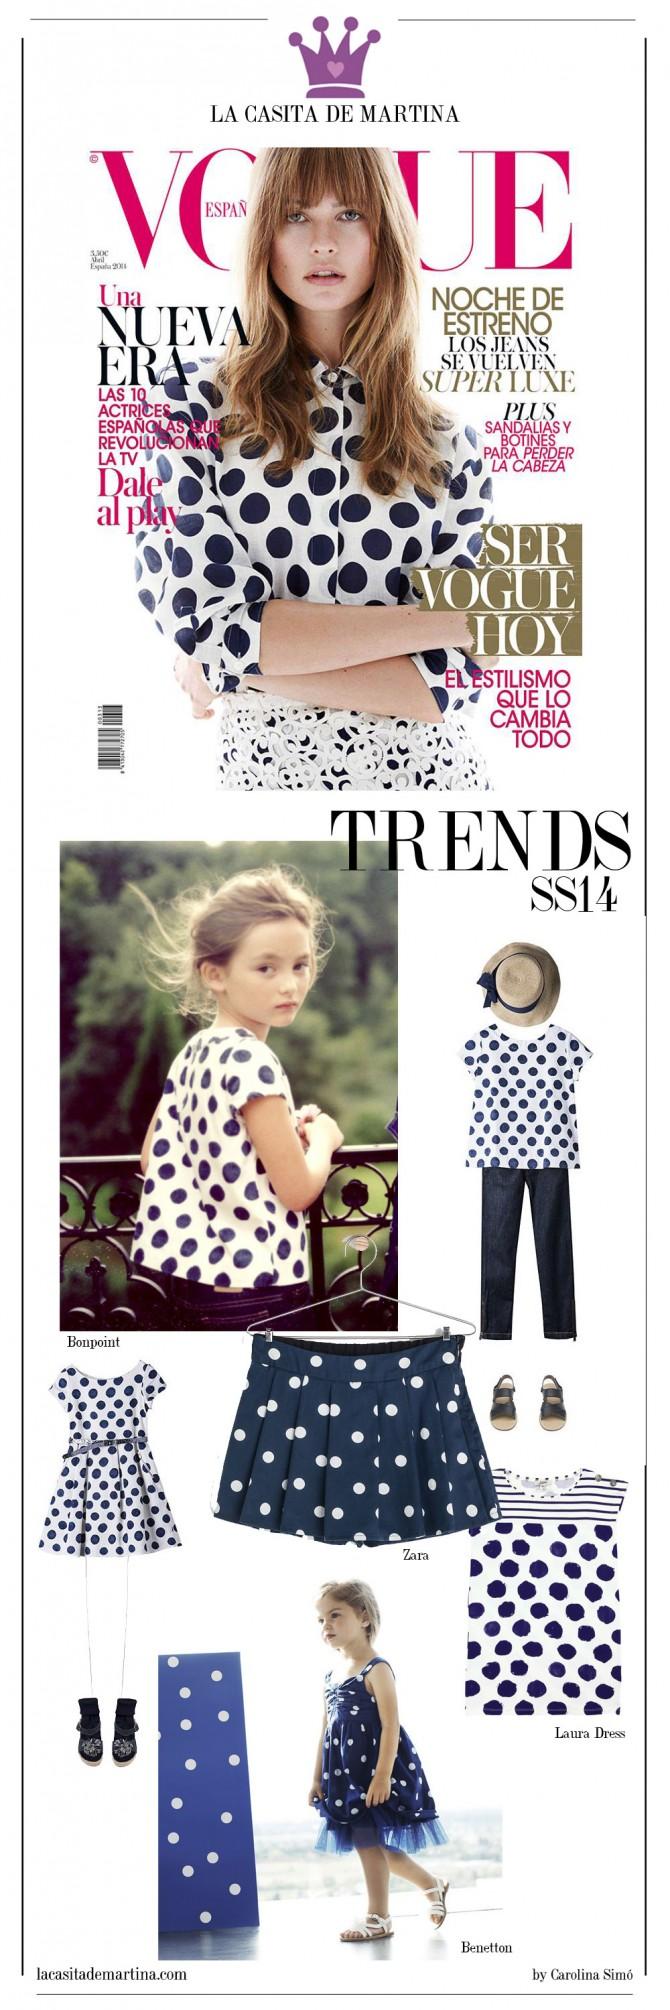 Vogue, Tendencias Moda Infantil verano 2014, Blog Moda Infantil,  La casita de Martina, Bonpoint